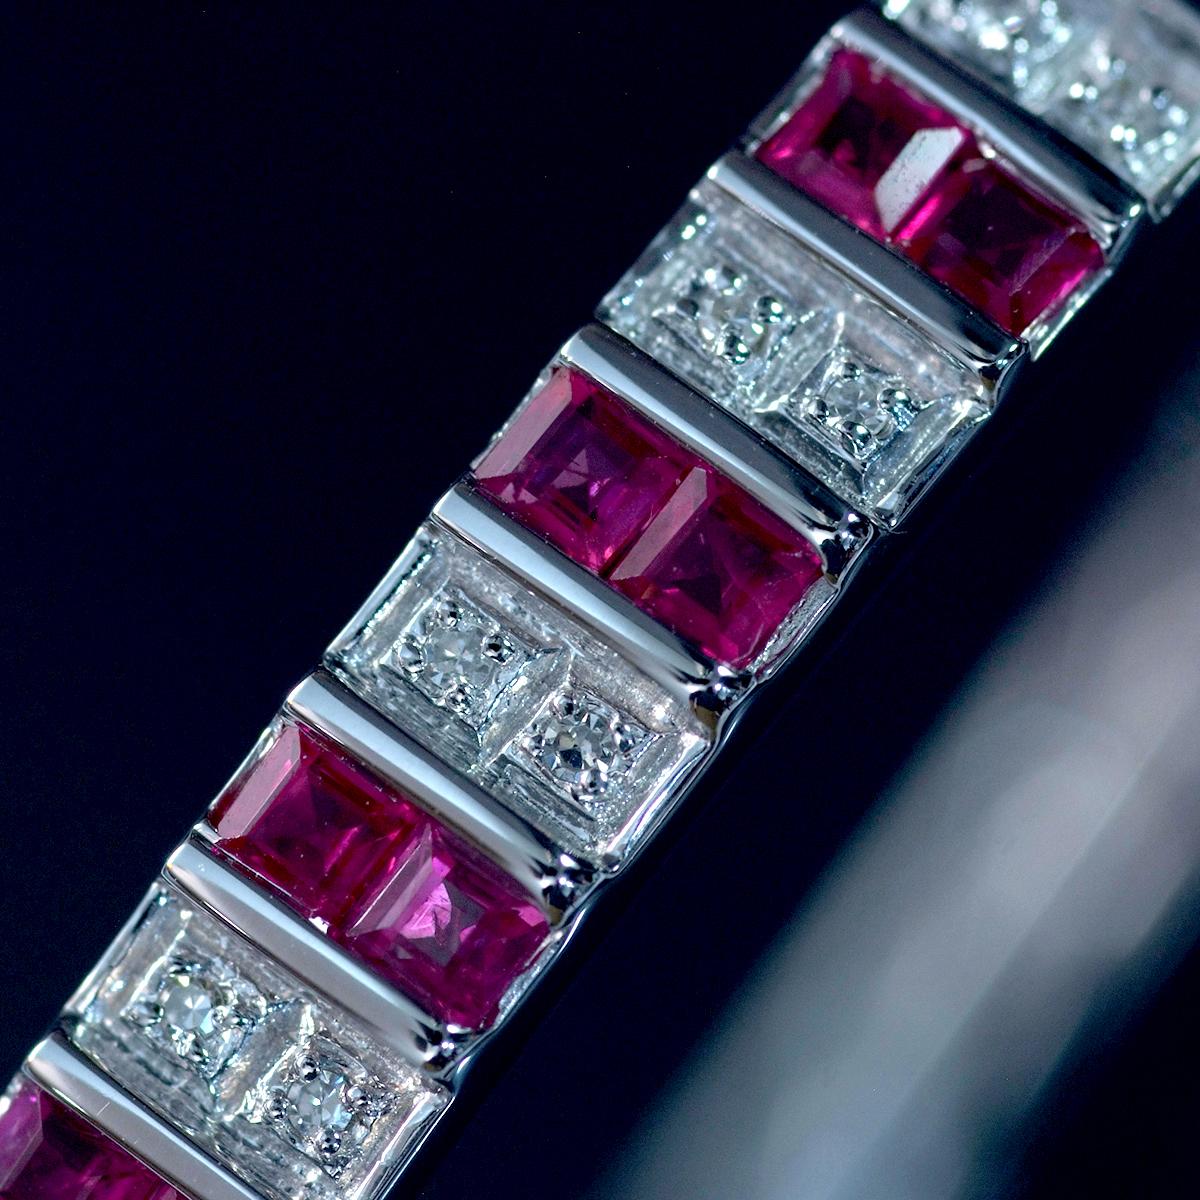 F0241 美しいルビー2.64ct 天然絶品ダイヤモンド0.12ct 最高級14金WG無垢バングル 腕周り15.5cm 重量15.06g 縦幅6.09mm_画像2